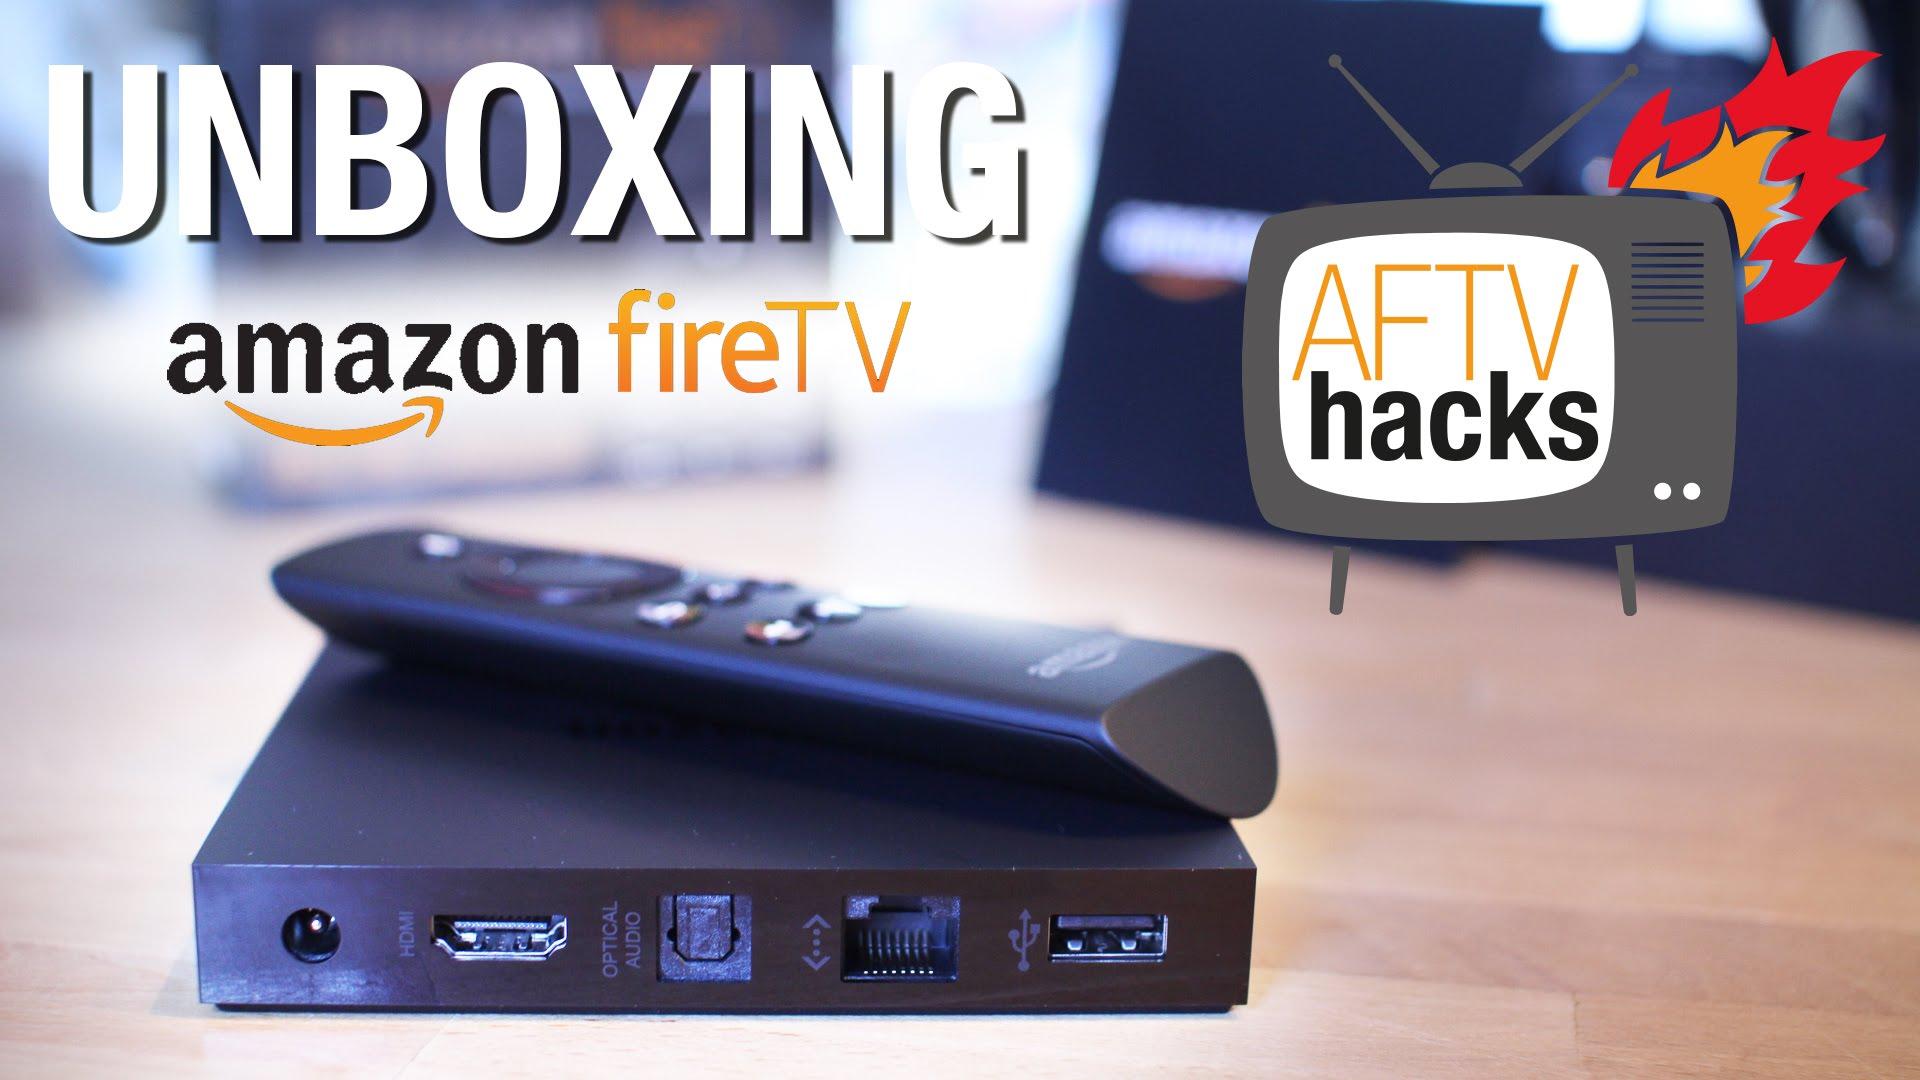 Unboxing-Video des deutschen Amazon Fire TV